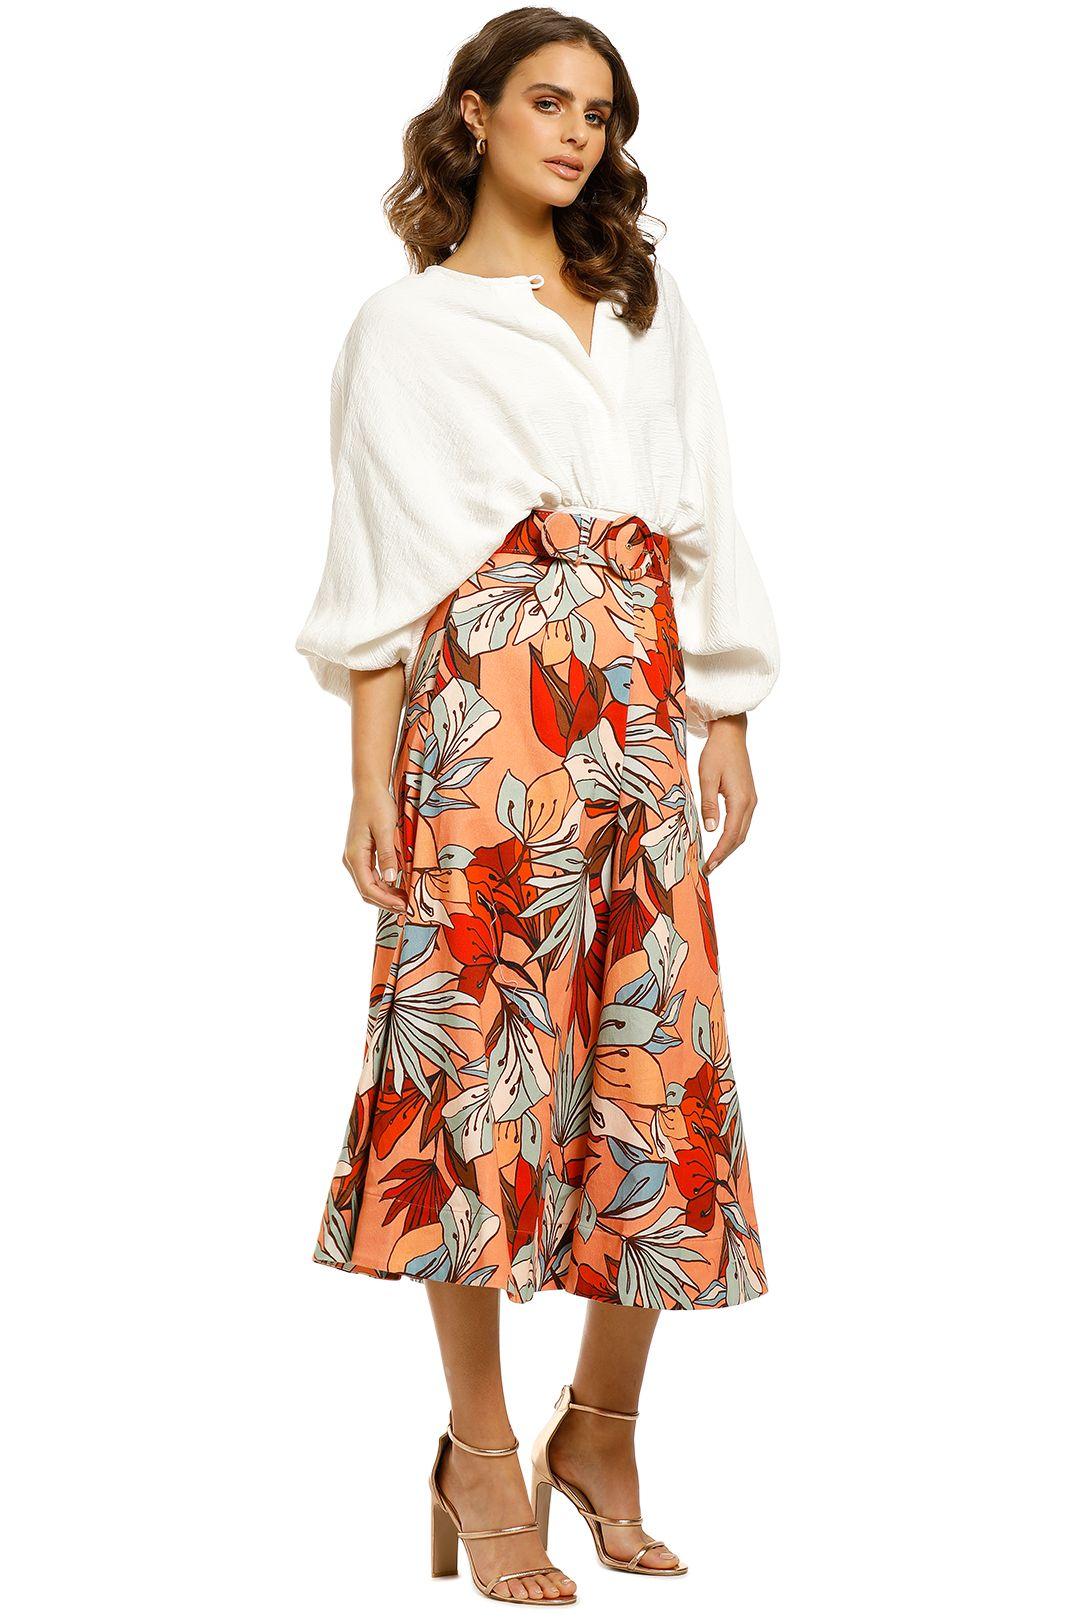 Nicholas-Jacqueline-Skirt-Tarama-Deco-Floral-Side